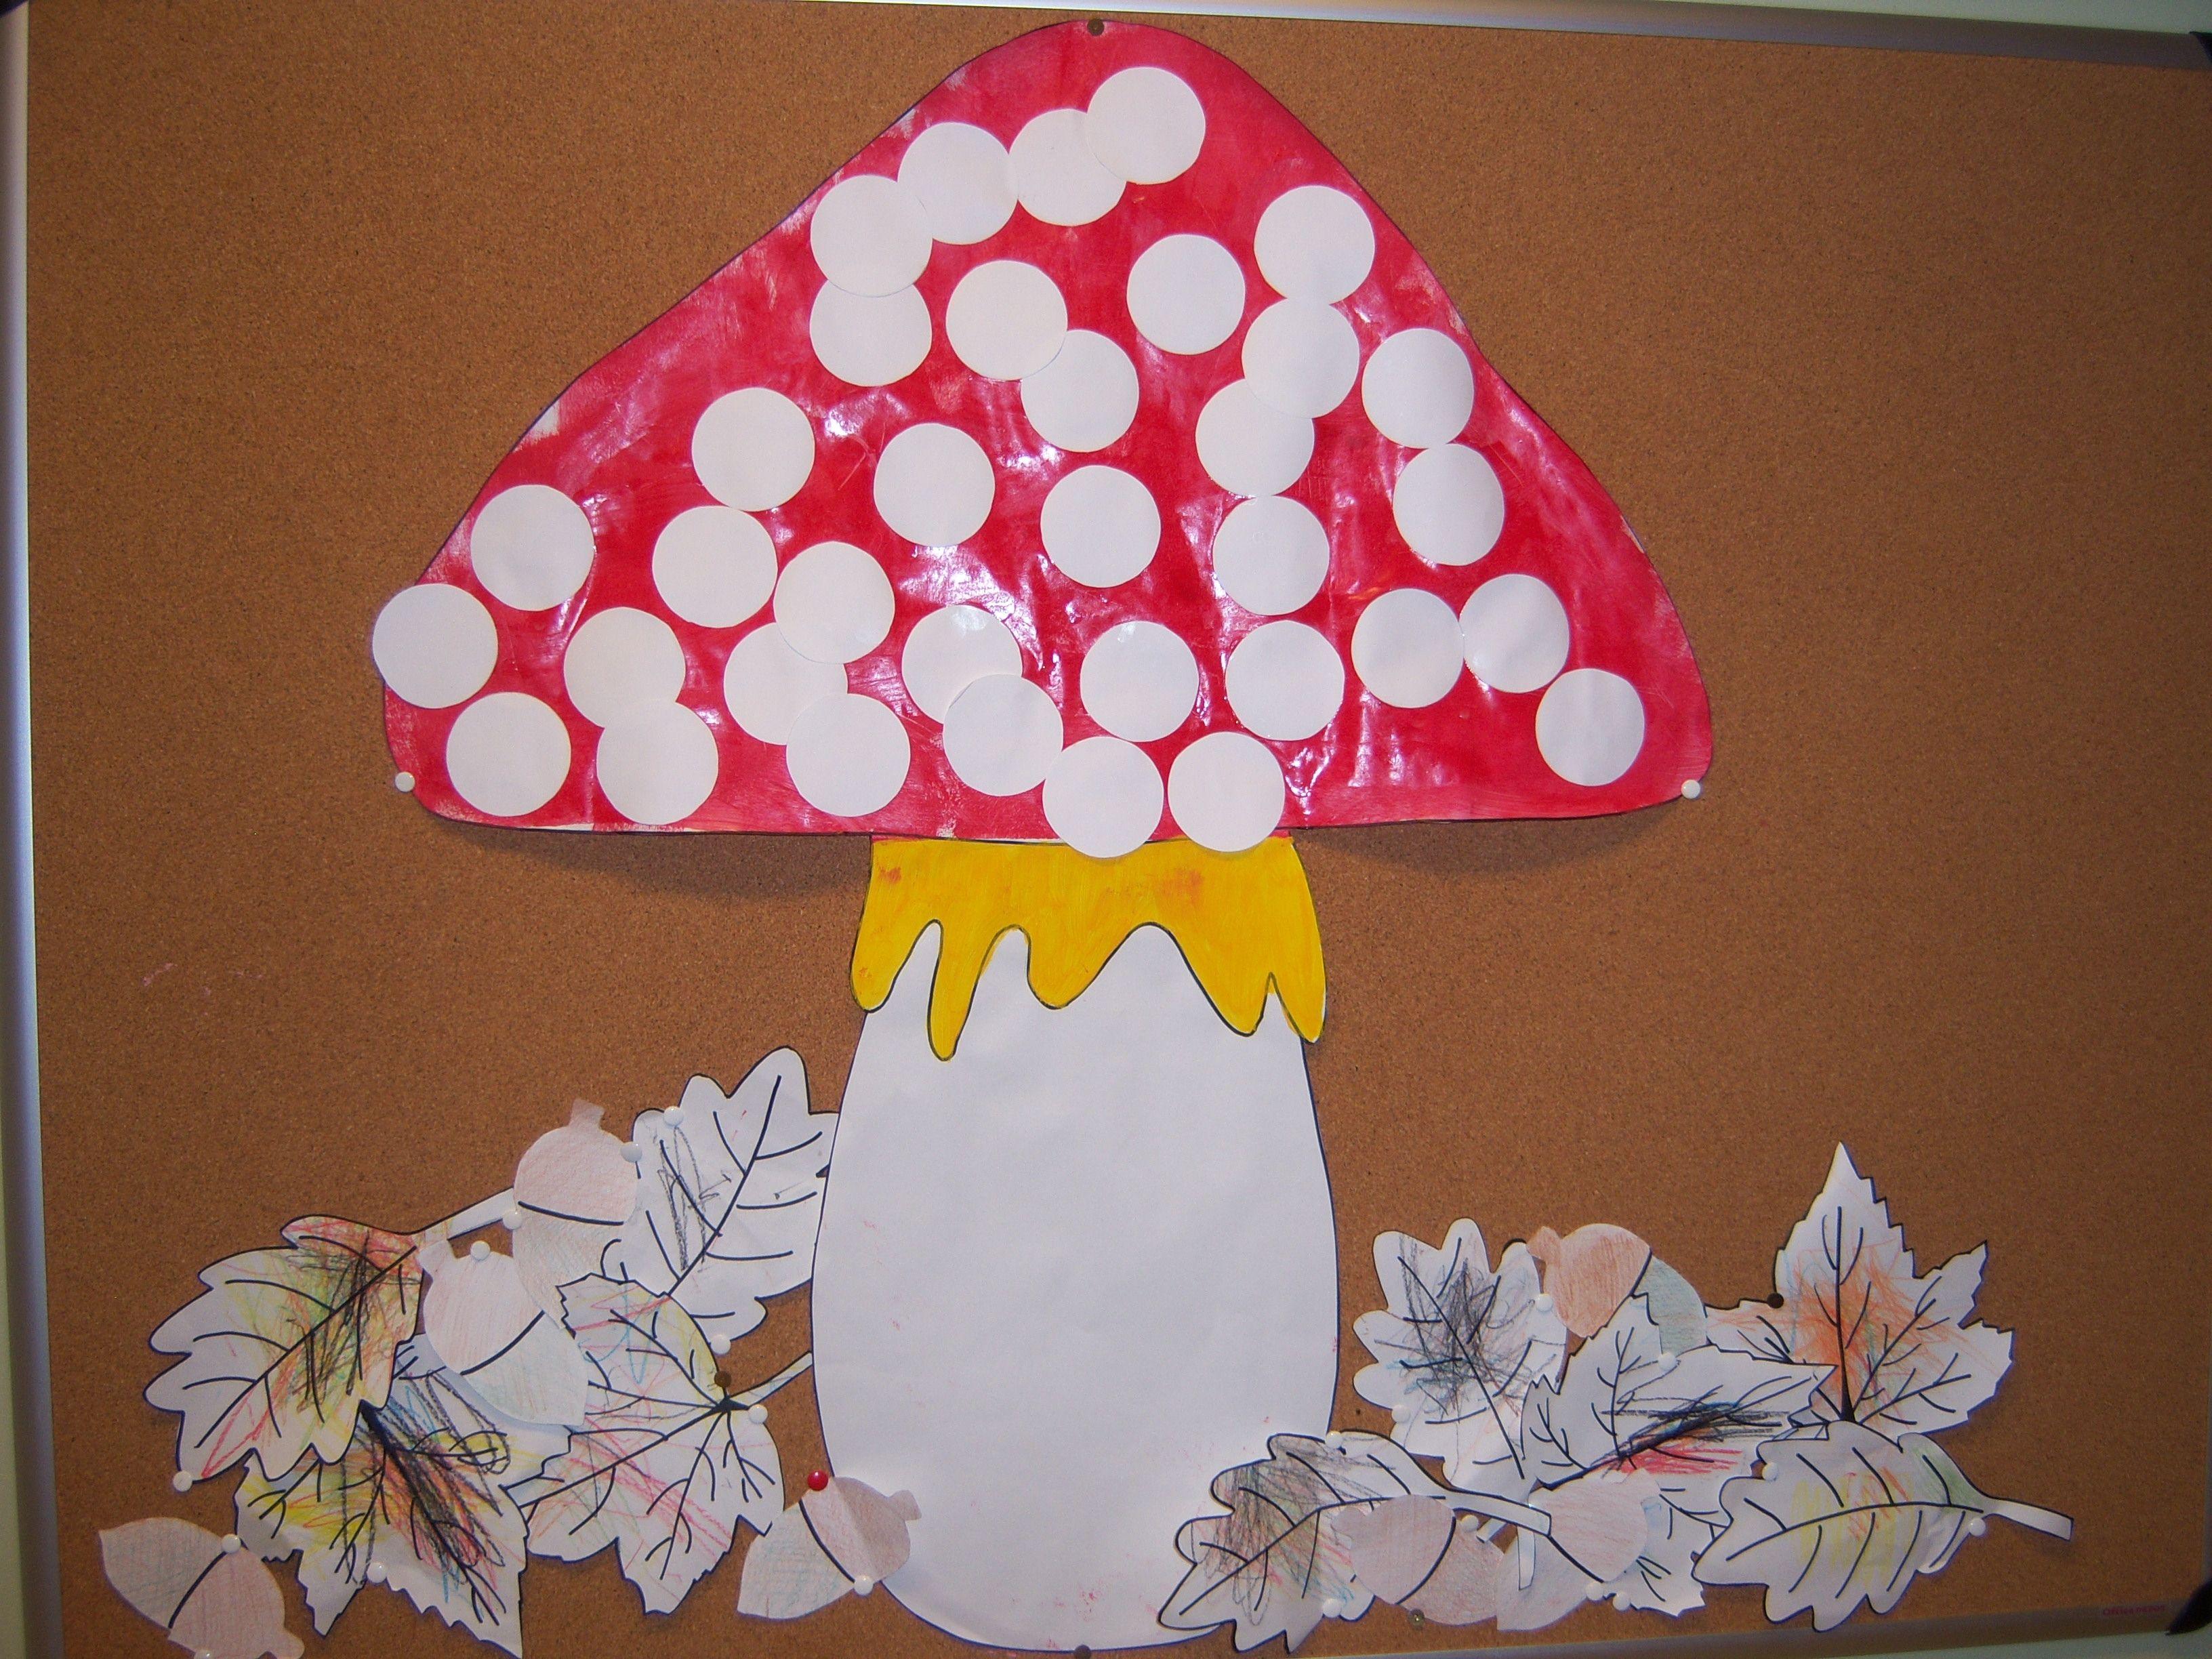 Paddestoel Eerst Laten Schilderen Later De Stippen Er Laten Opplakken Mushrooms